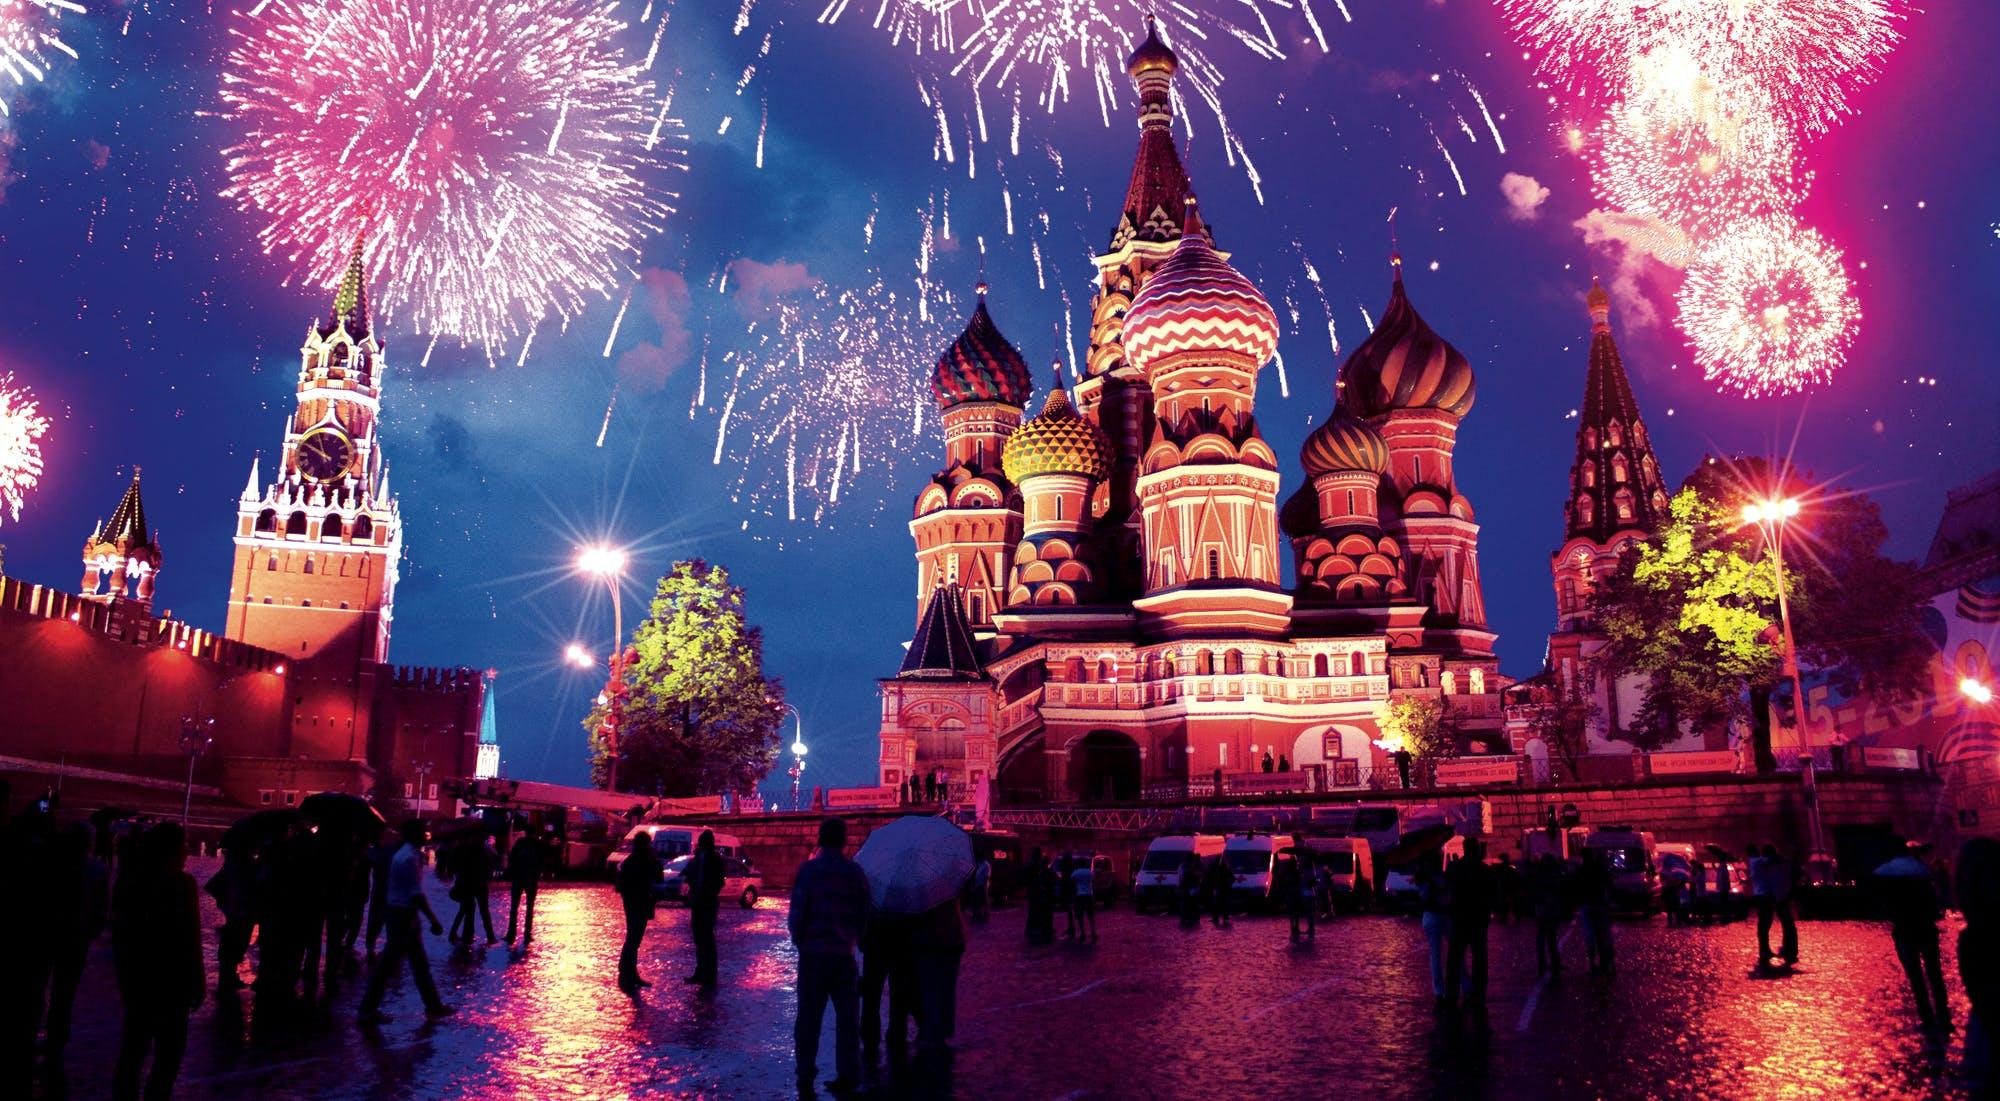 russia-fireworks-fullwidth